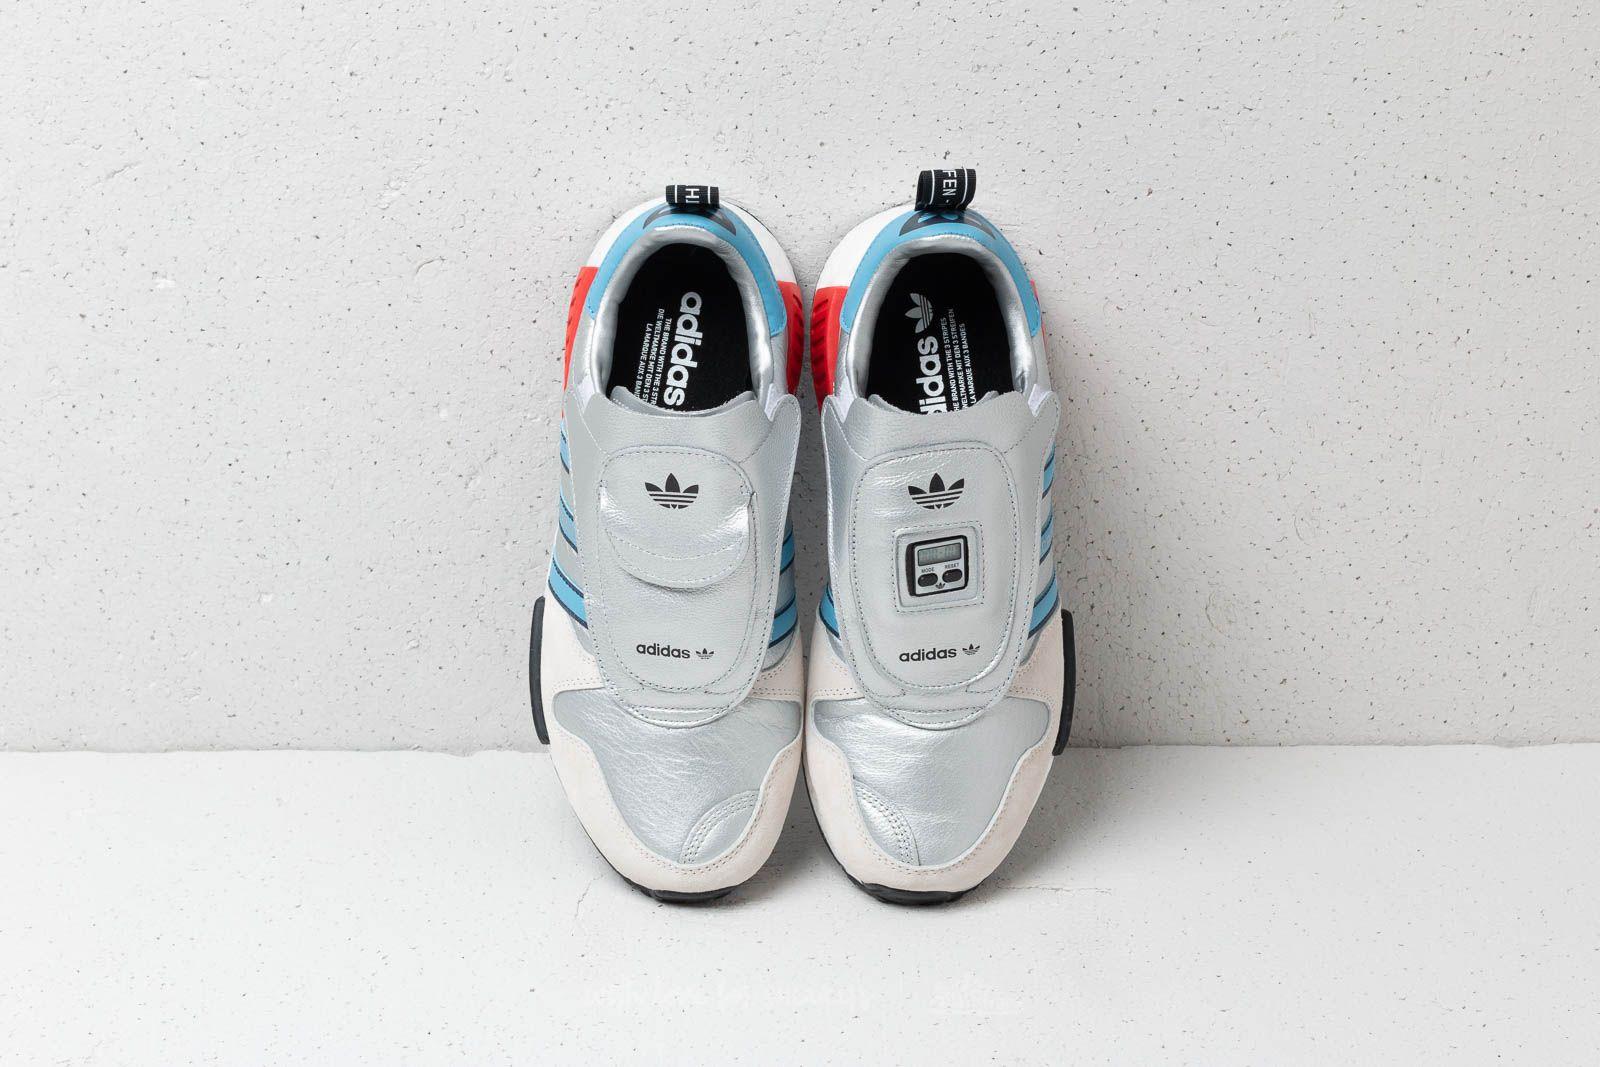 Ftw WhiteFootshop Metallic Blue Light Micropacer X Silver Adidas R1 8nwN0m